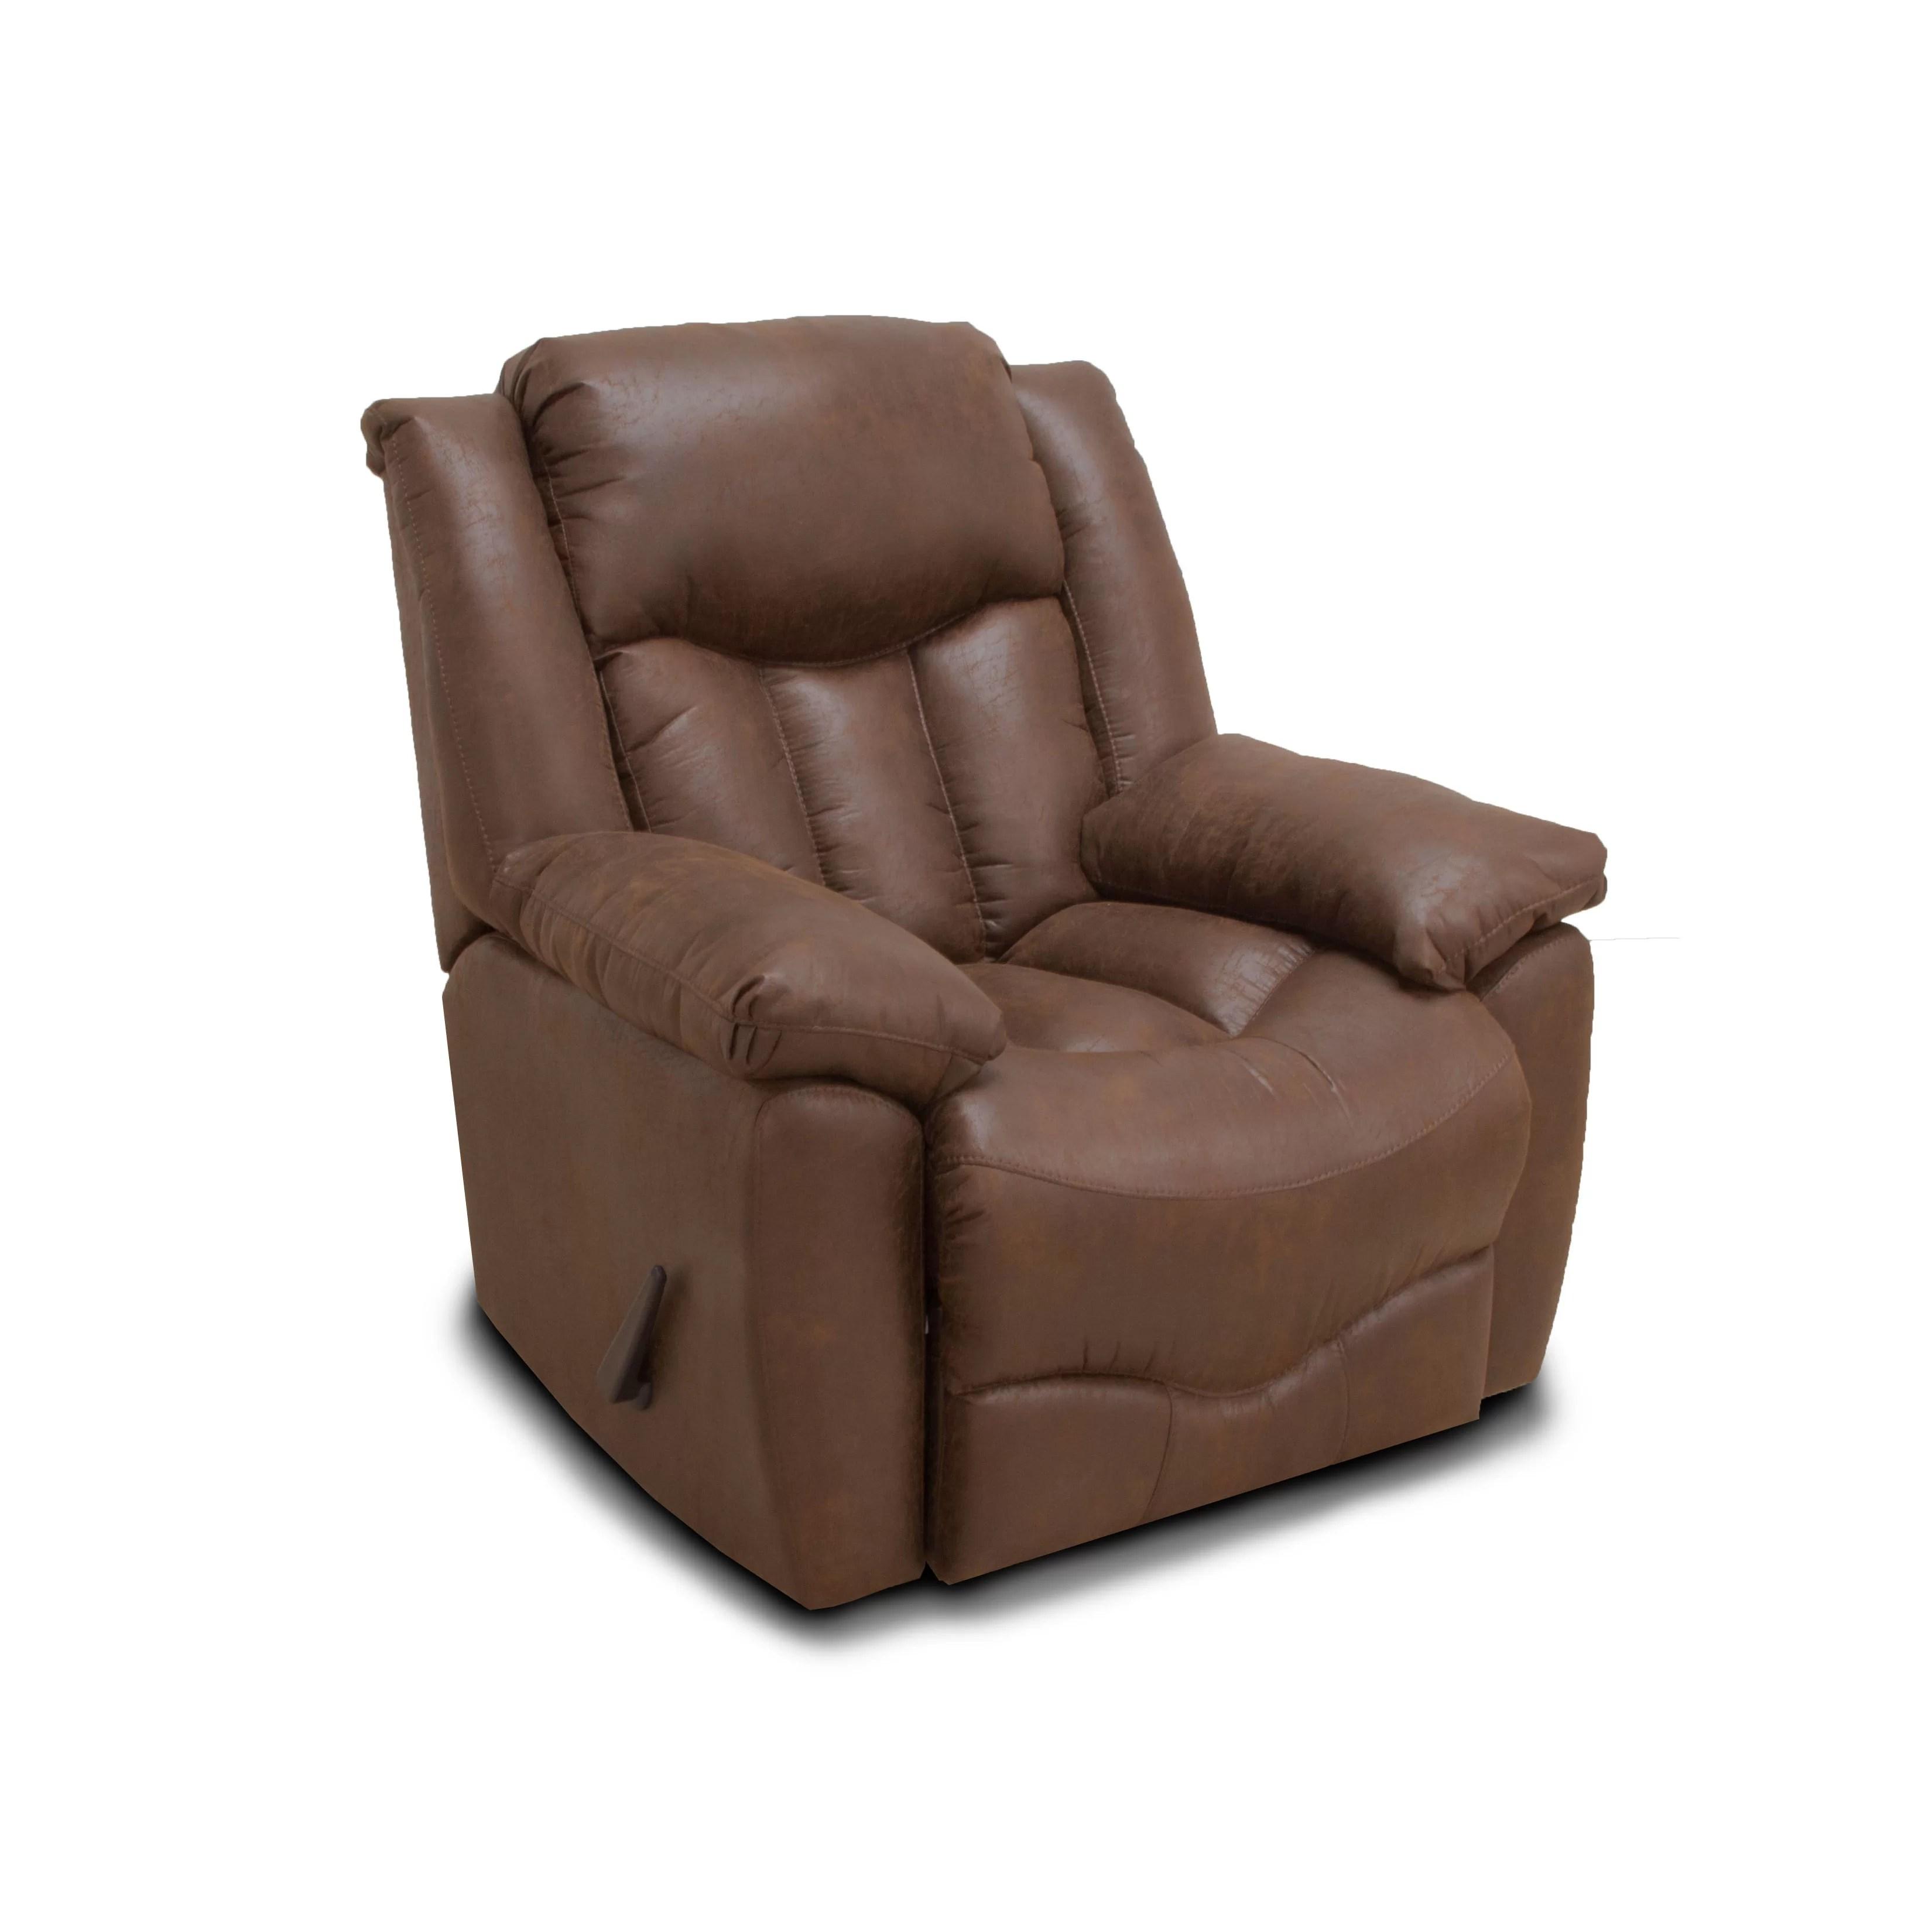 barrel chairs swivel rocker pottery barn patterson chair red studio jenkins recliner wayfair ca